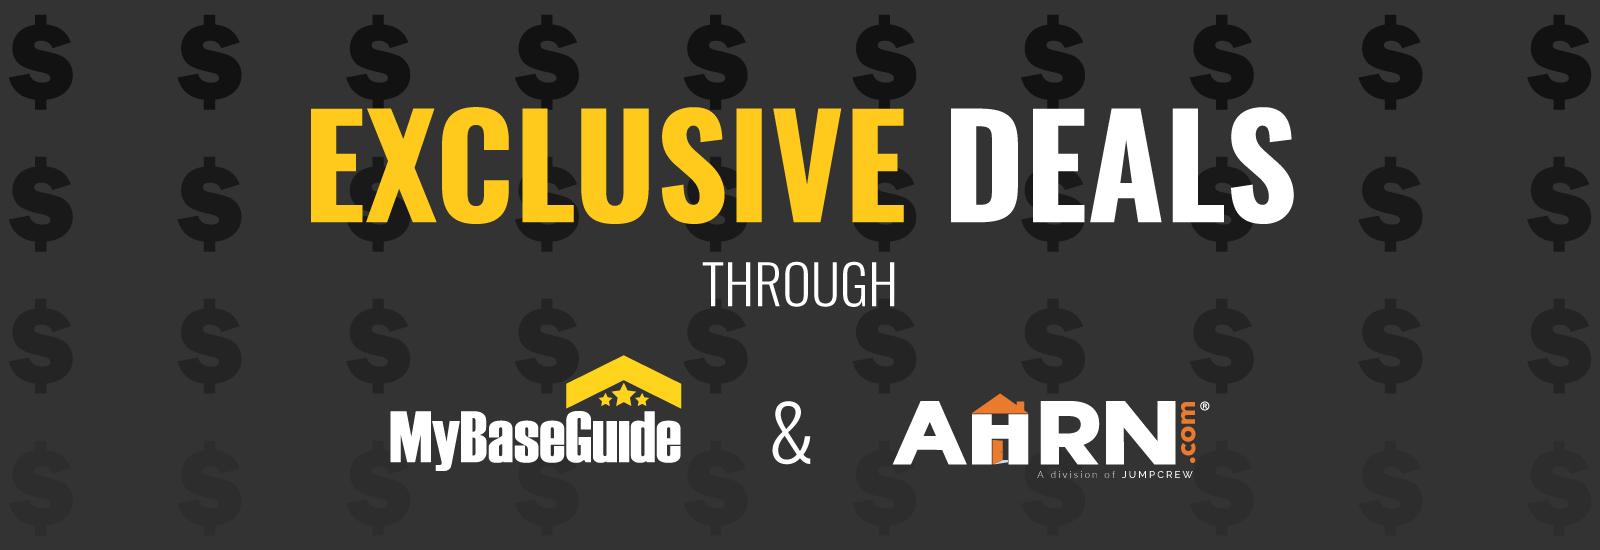 Exclusive Deals Through AHRN.com and MyBaseGuide